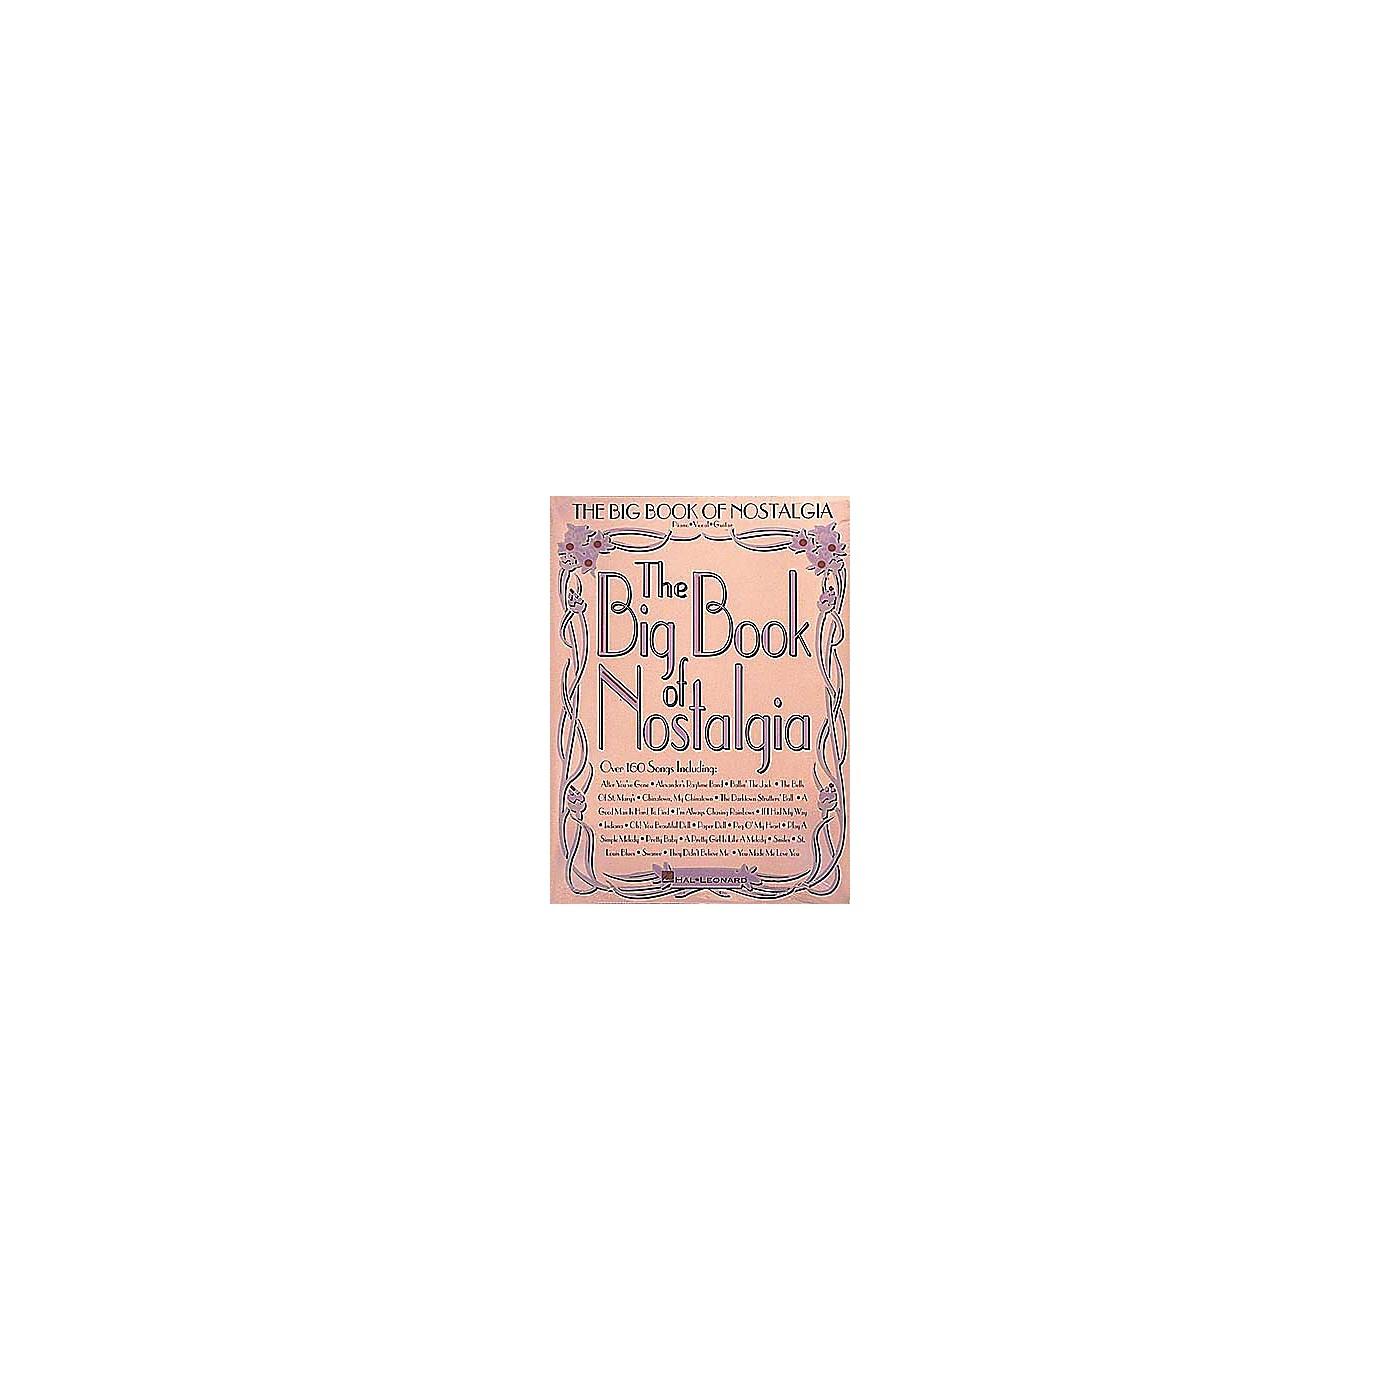 Hal Leonard The Big Book of Nostalgia Piano, Vocal, Guitar Songbook thumbnail